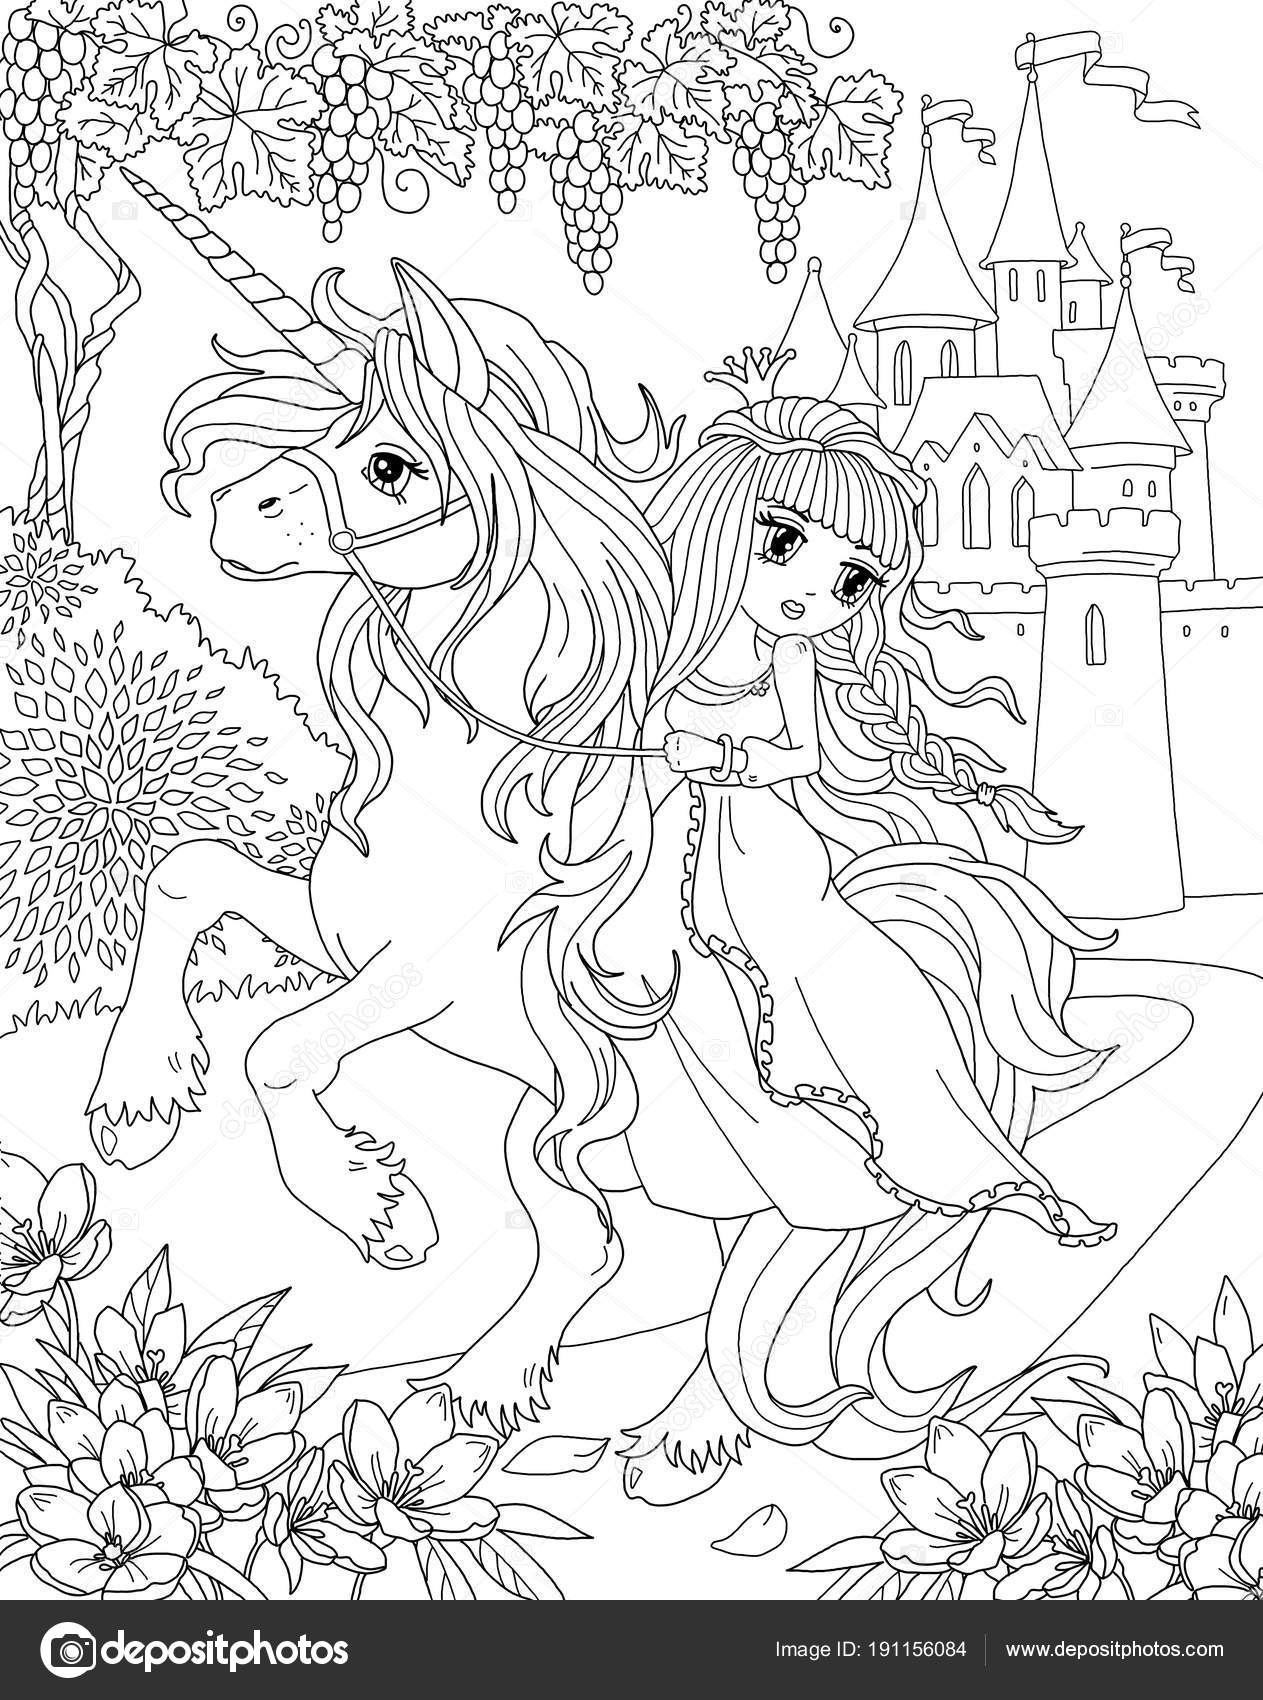 Coloriage Princesse Avec Licorne.Coloriage Licorne Princesse Photographie Larisakuzovkova C 191156084